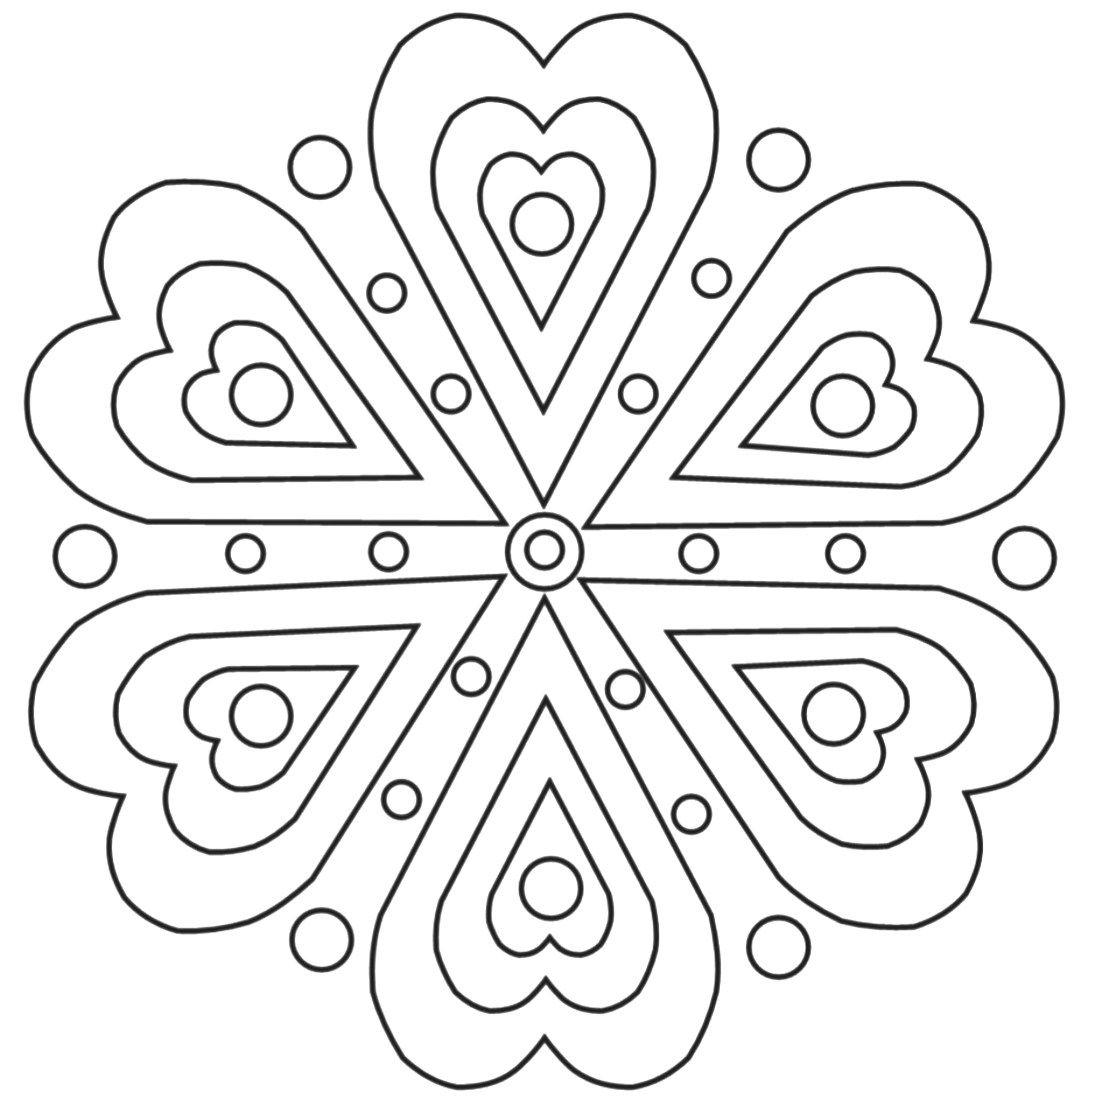 Meditate & Mandalas: Ancient Art Form - SOL CENTER West | vorlagen ...